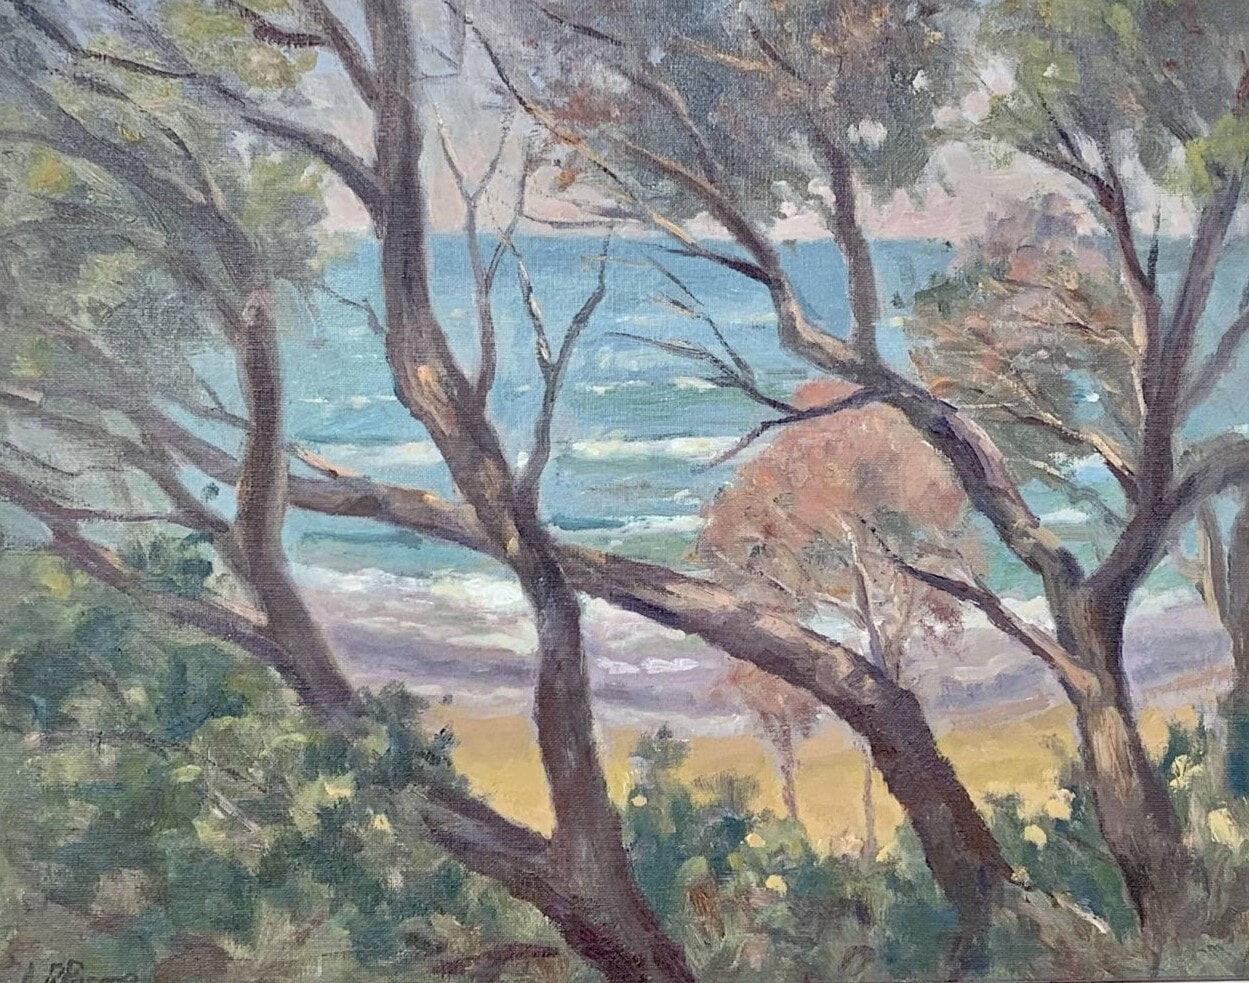 Tea Tree View, Lake Tyers_Oil on Canvas_Leslie Pascoe_550